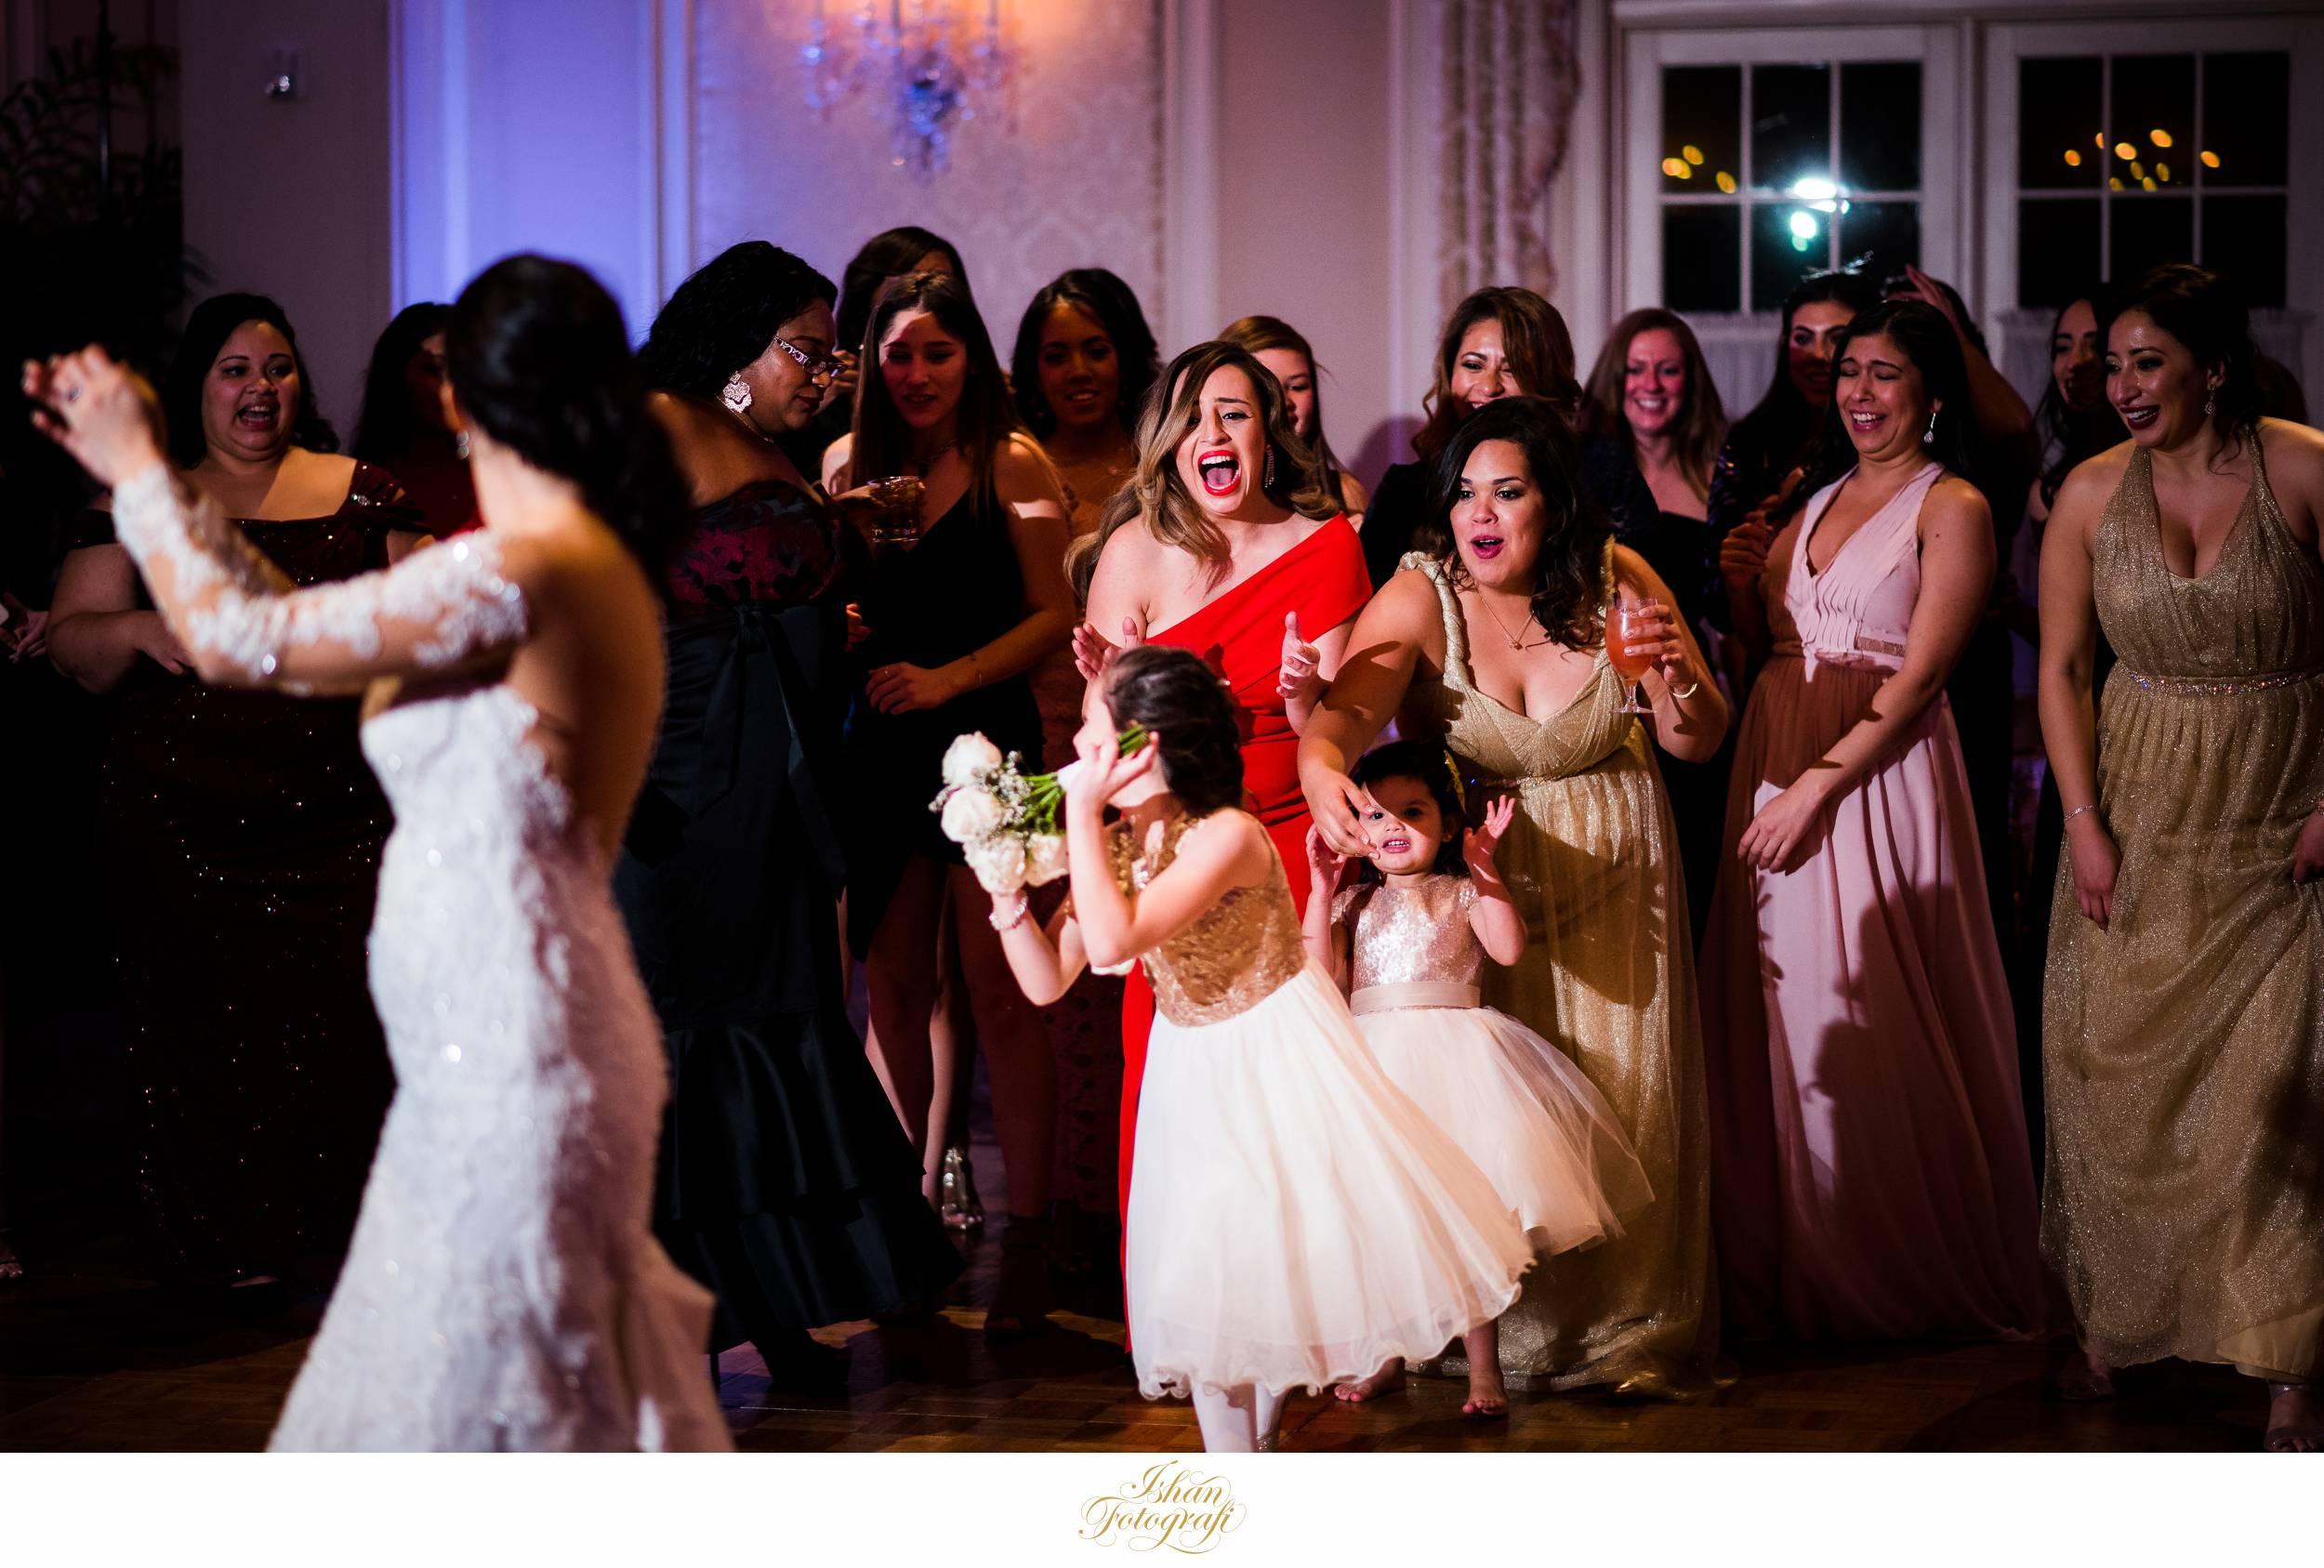 wedding-bouquet-toss-meadow-wood-manor-randolph-nj